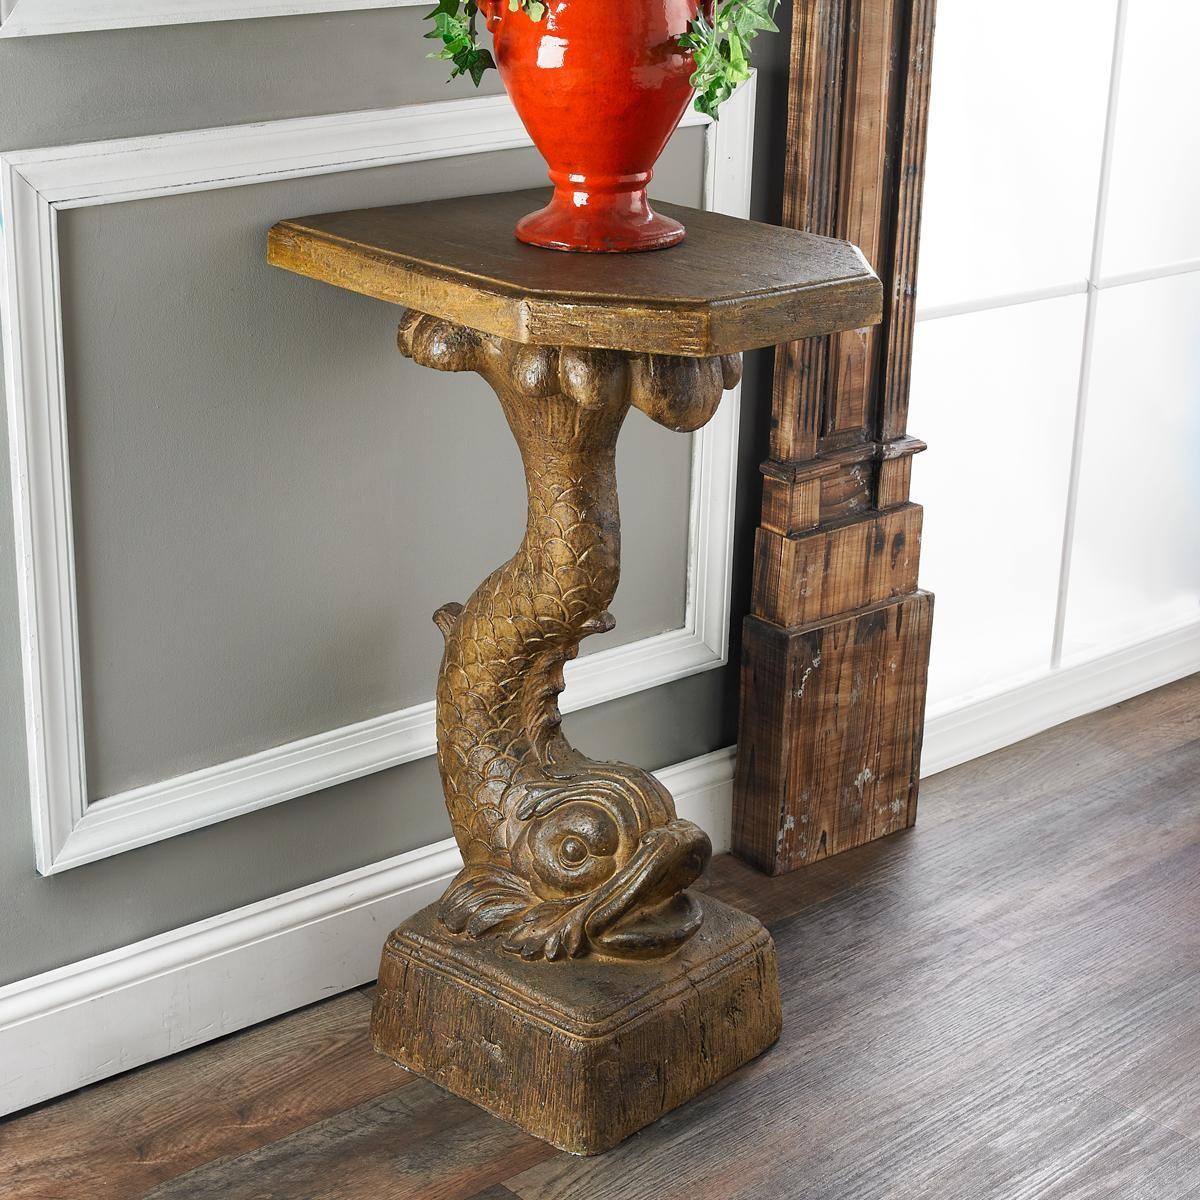 Strata art glass pendant light brown finish pedestal for Koi furniture